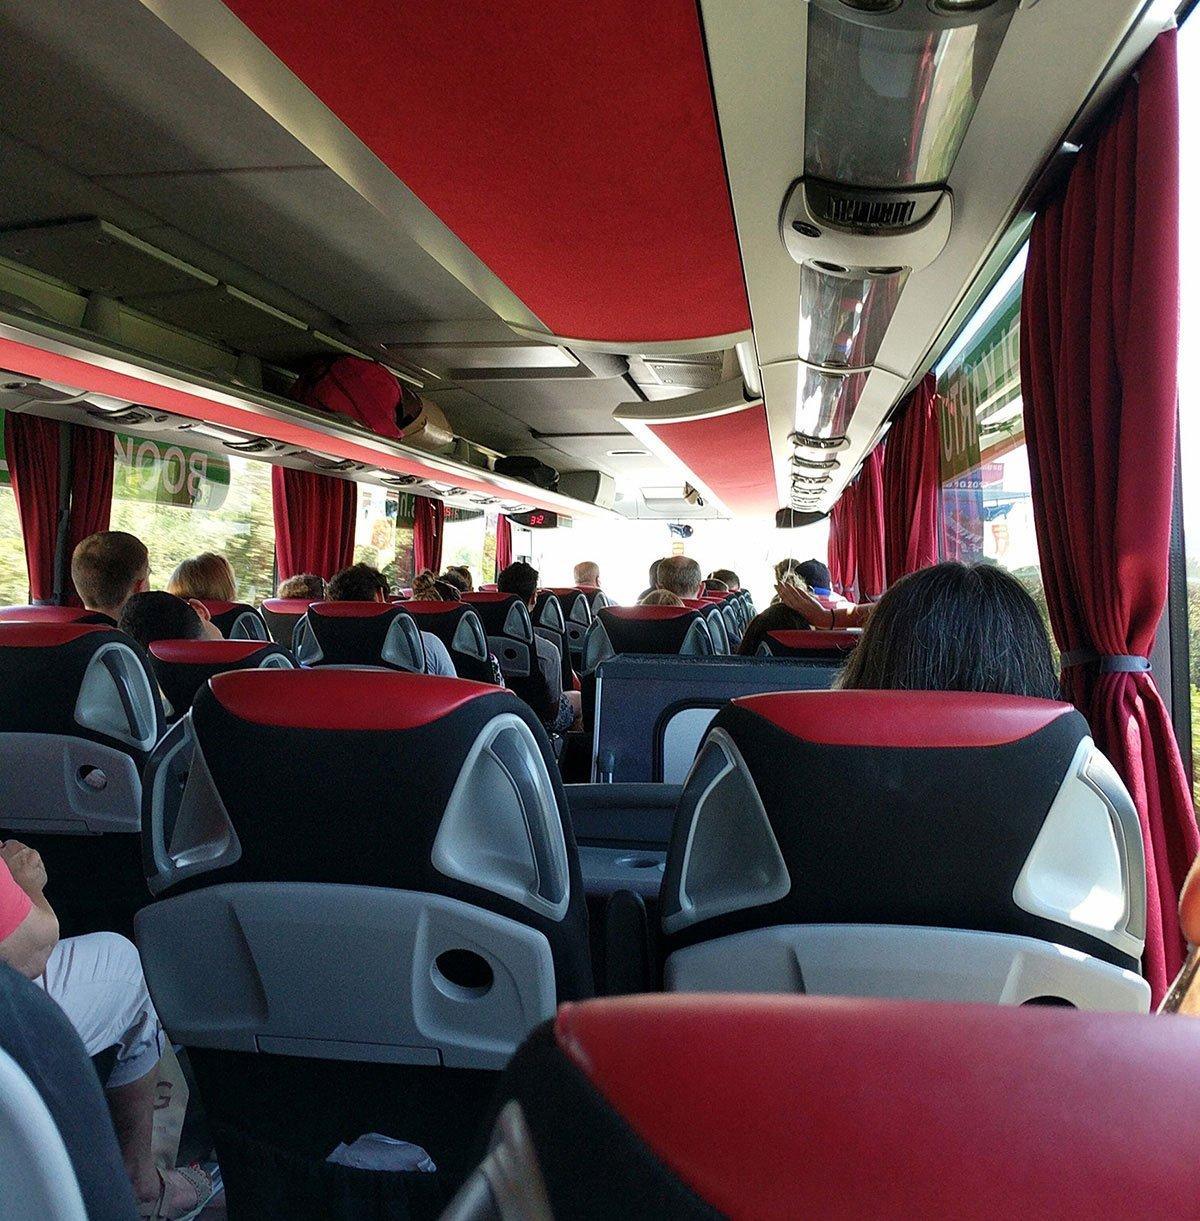 An intercity bus in croatia